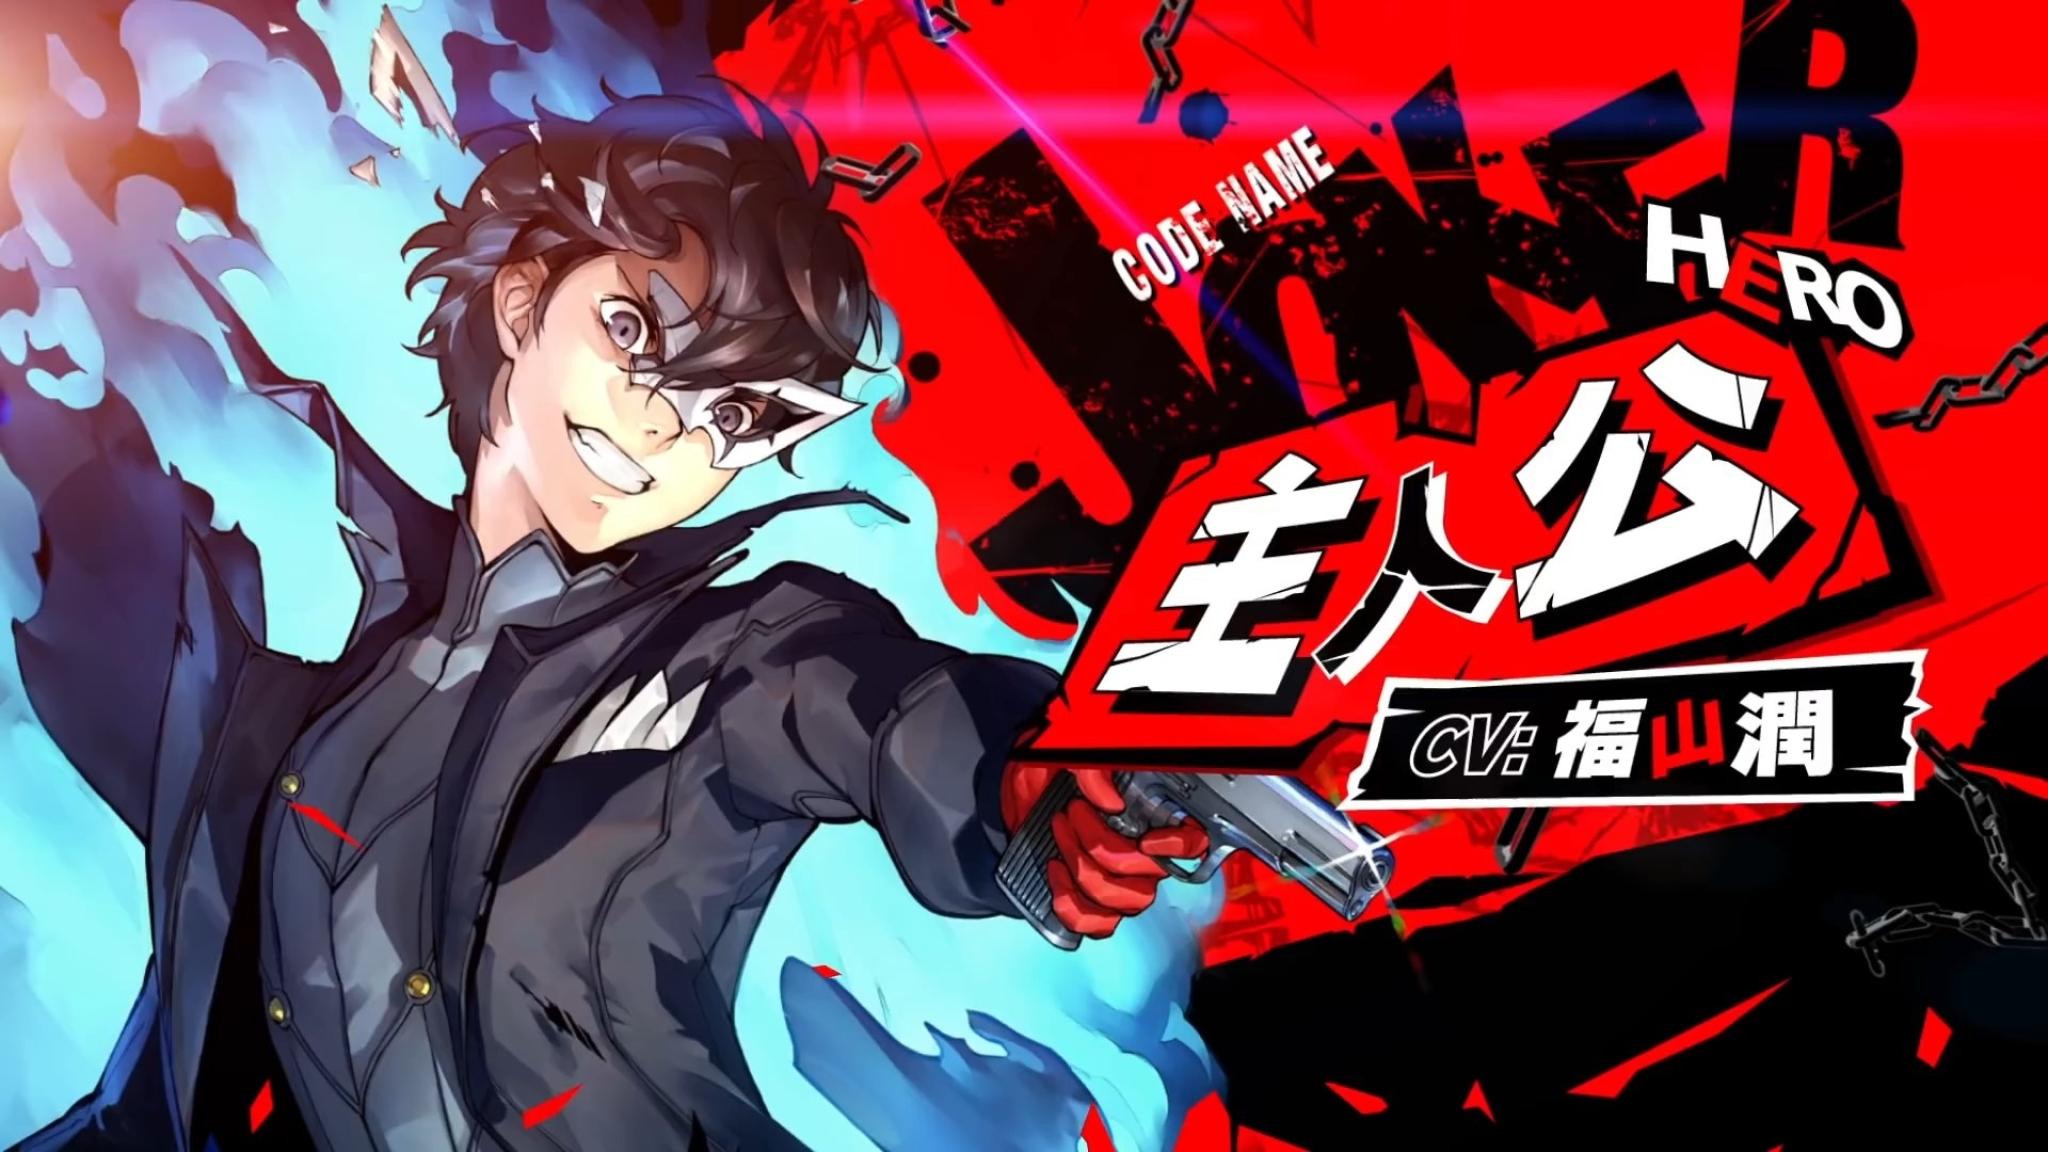 2048x1152 Joker Persona 5 Scramble The Phantom Strikers ...